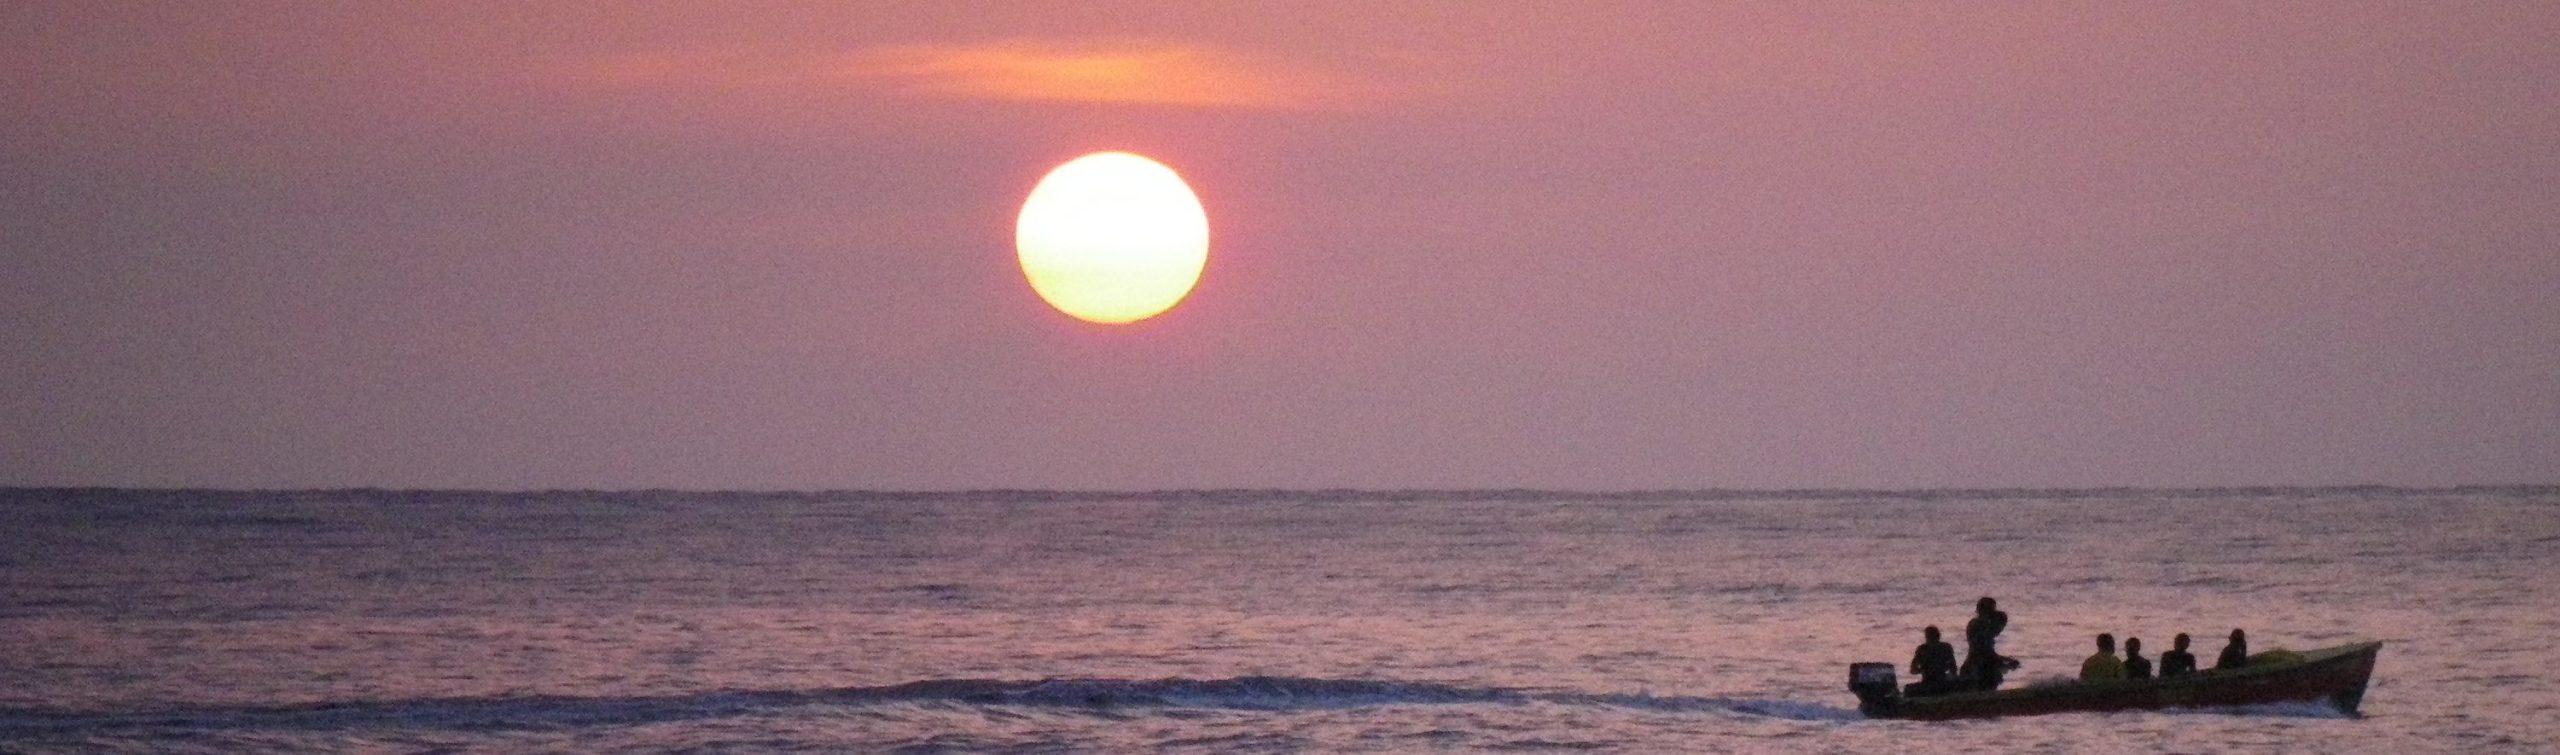 Jamaica-sunset-boat